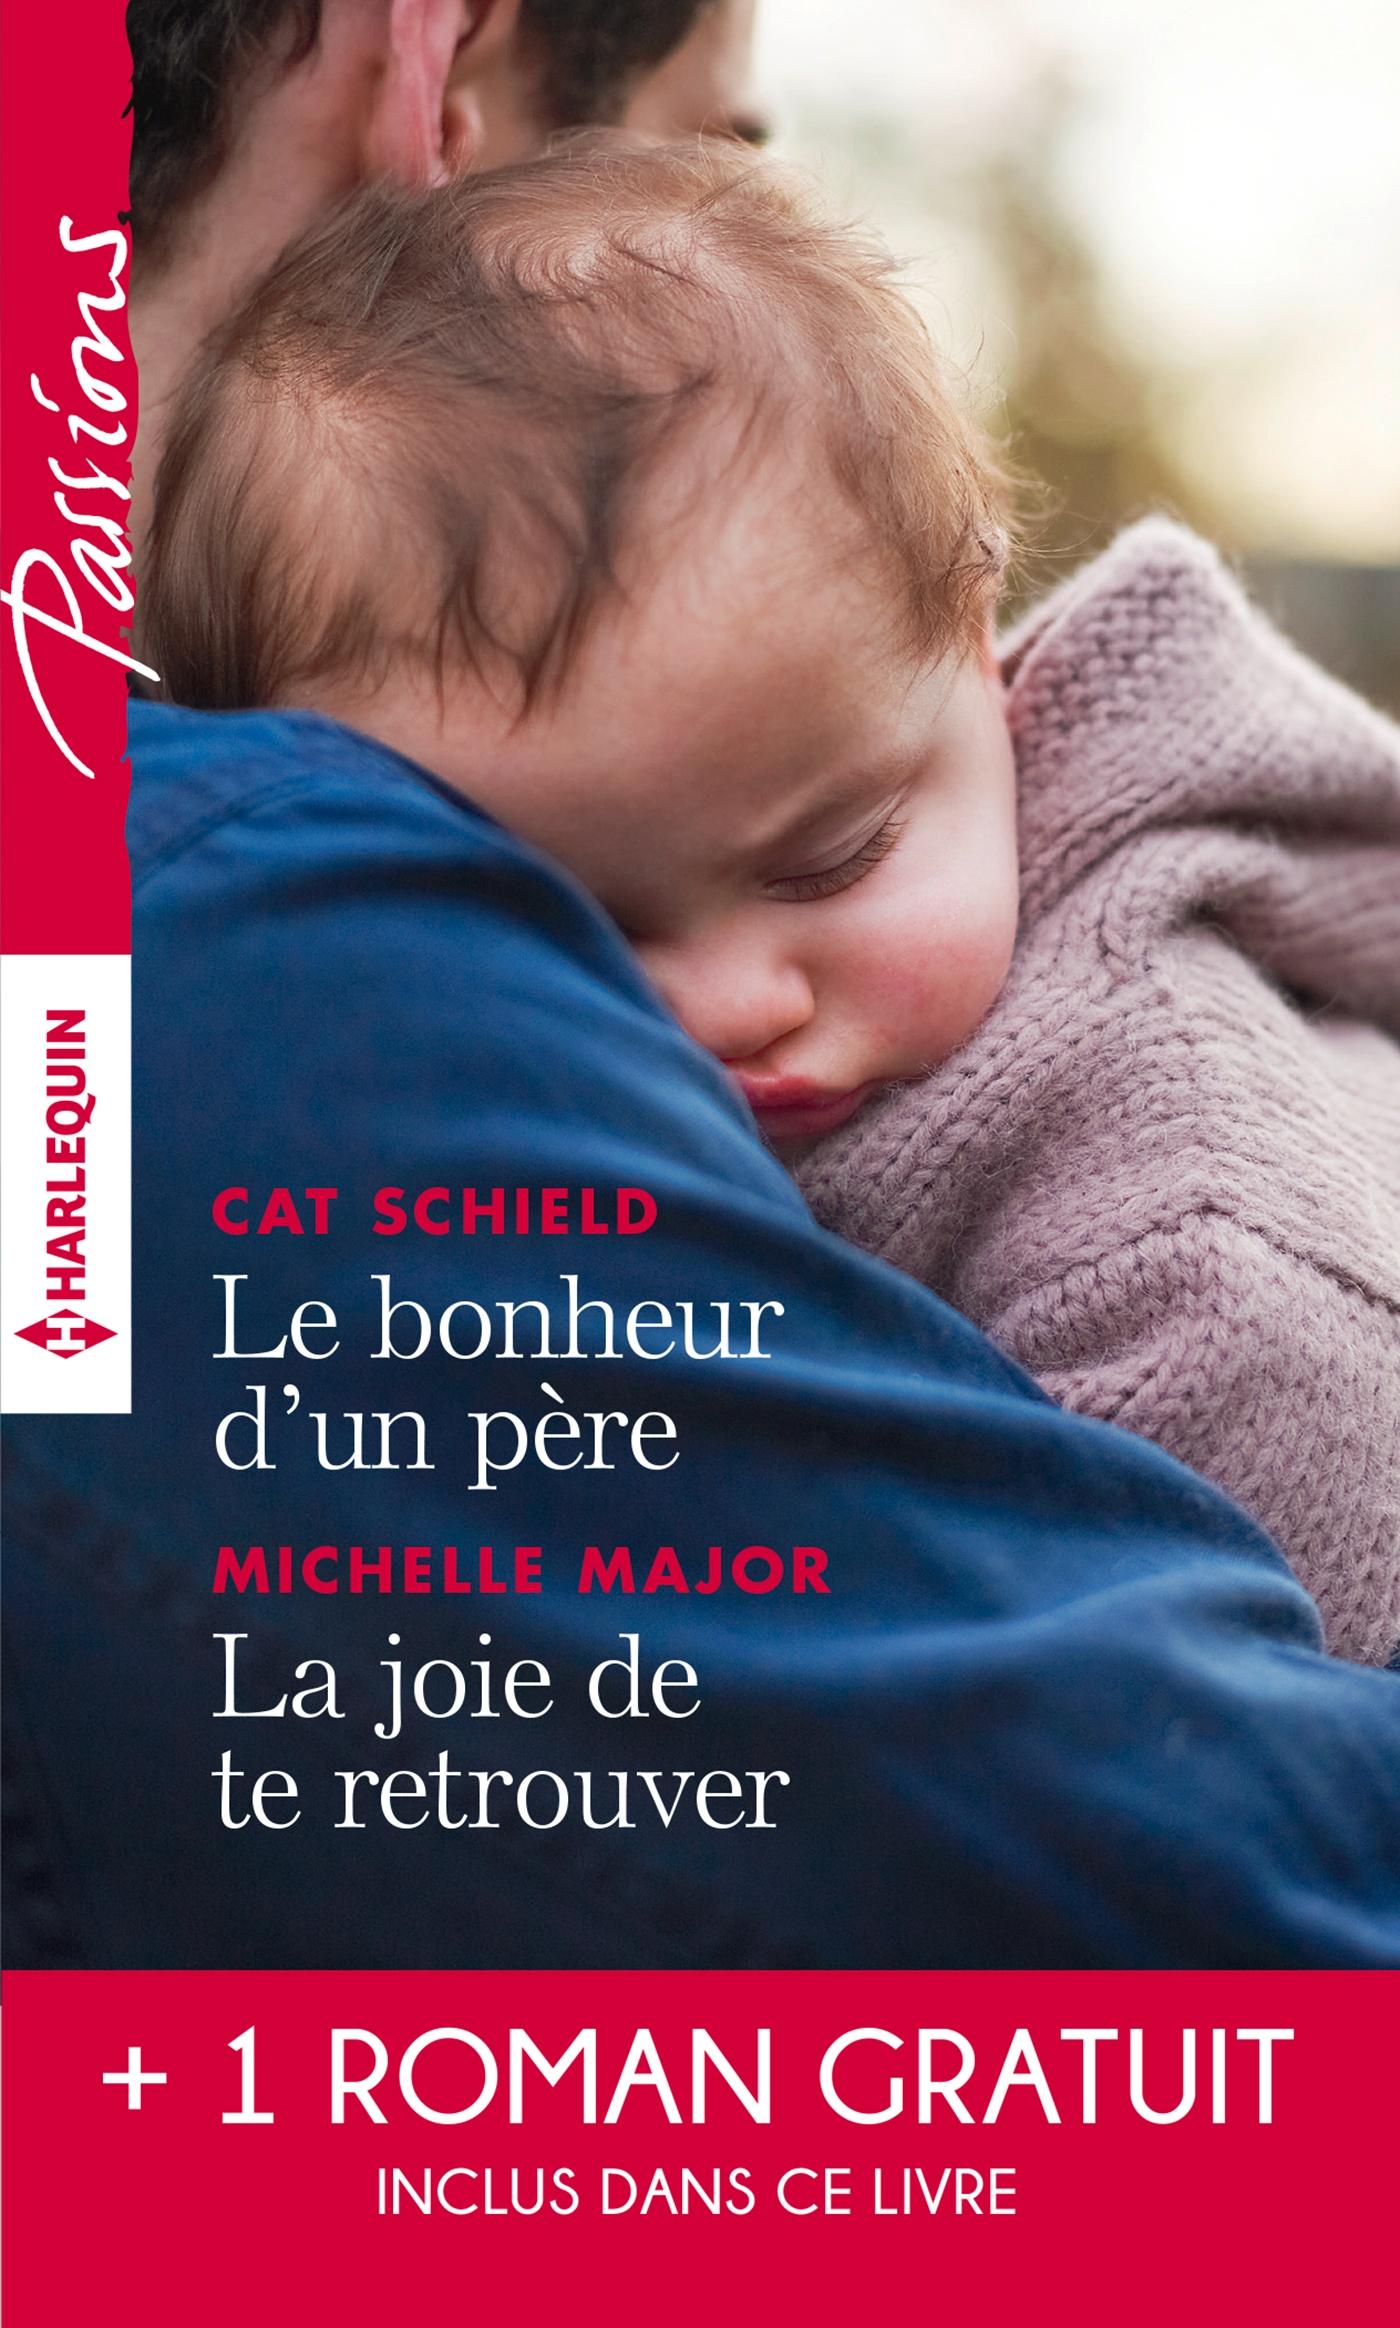 www.harlequin.fr/images/Livre-Hachette/HD/9782280362276.jpg